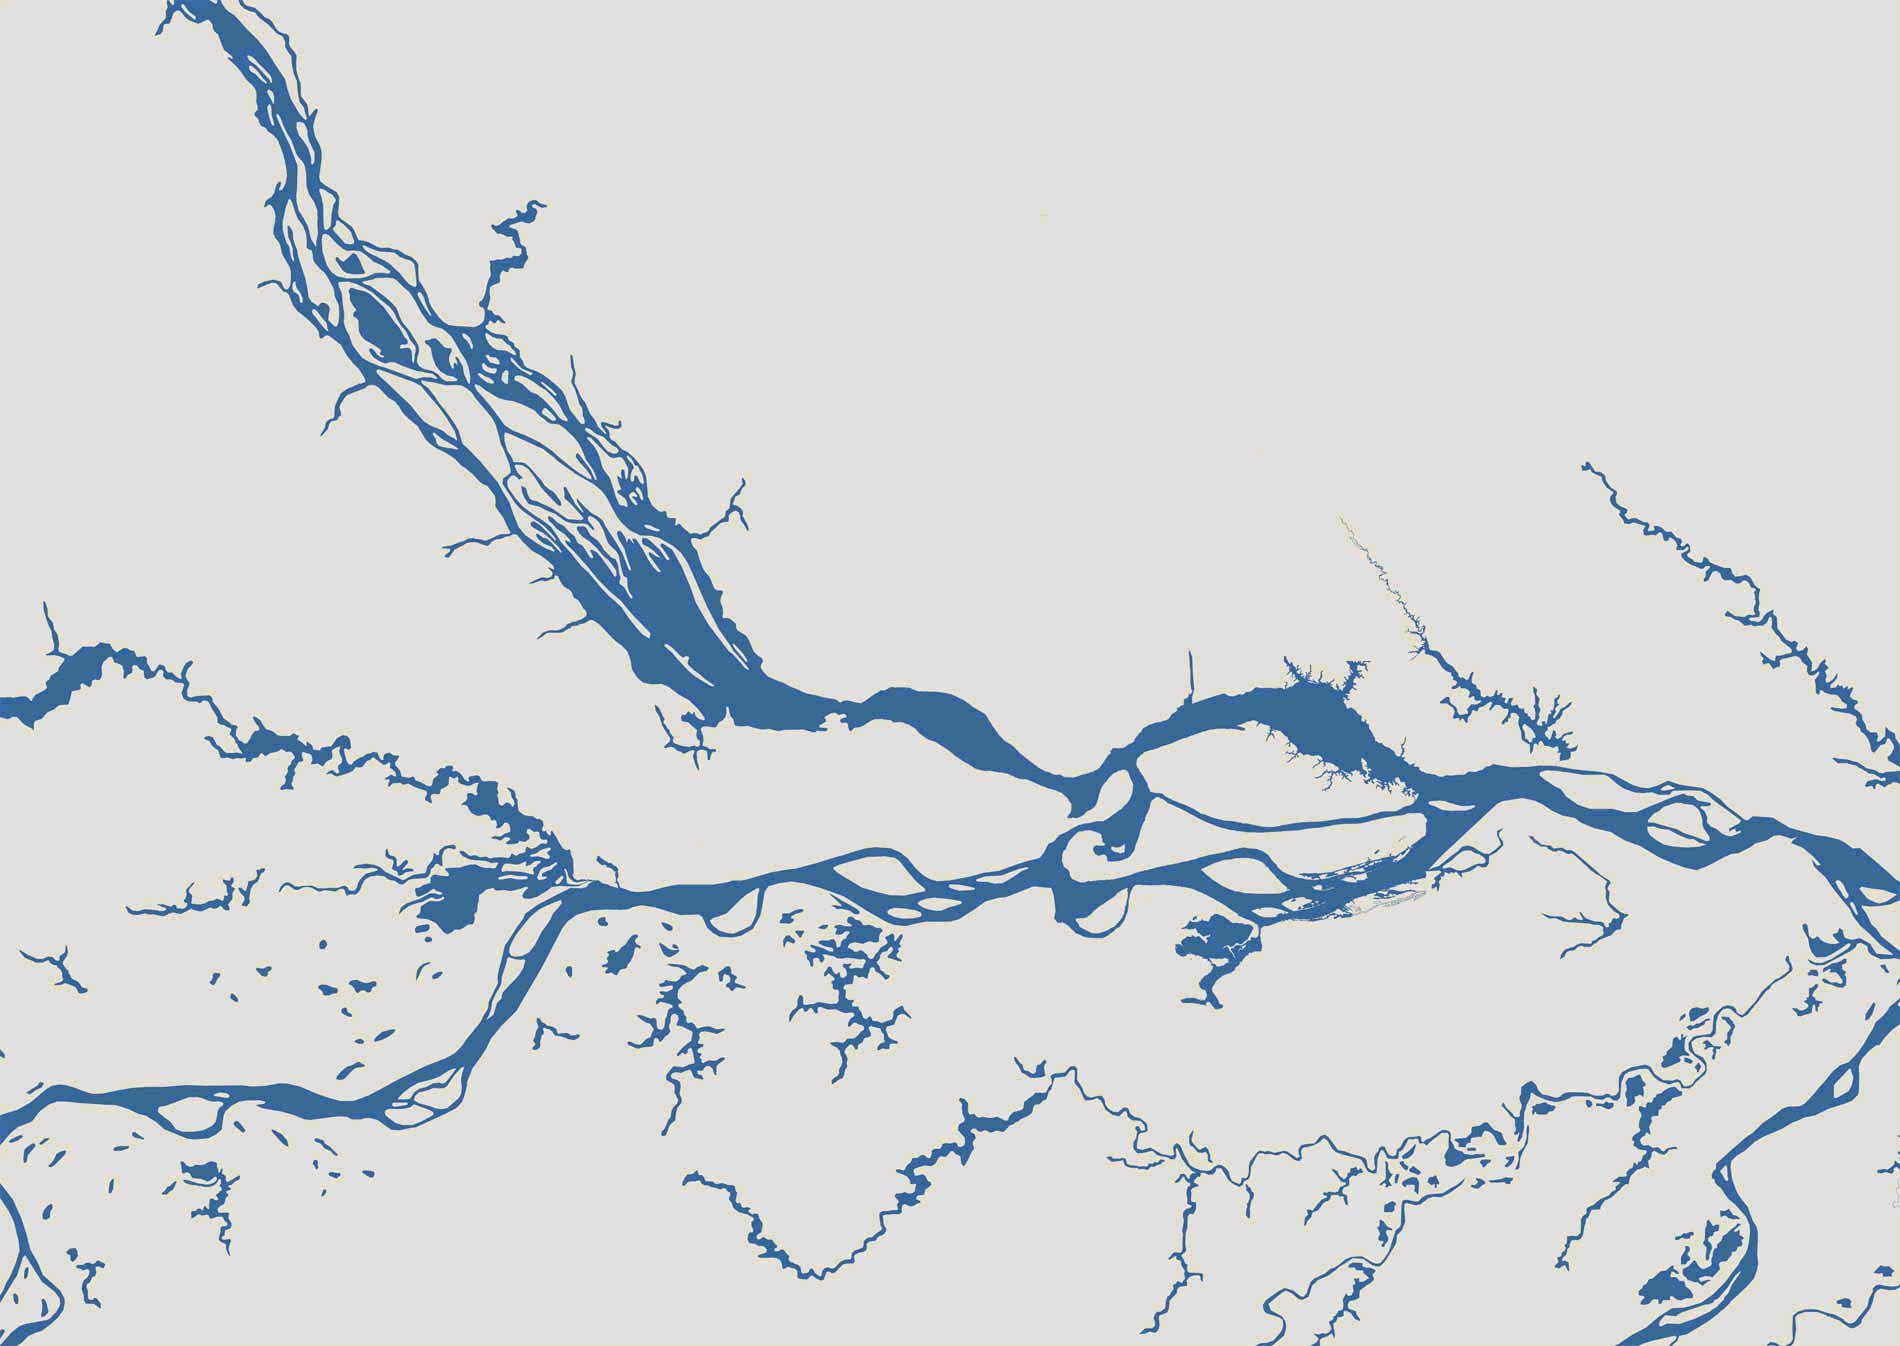 Map for Grand Maguari Amazon Cruise